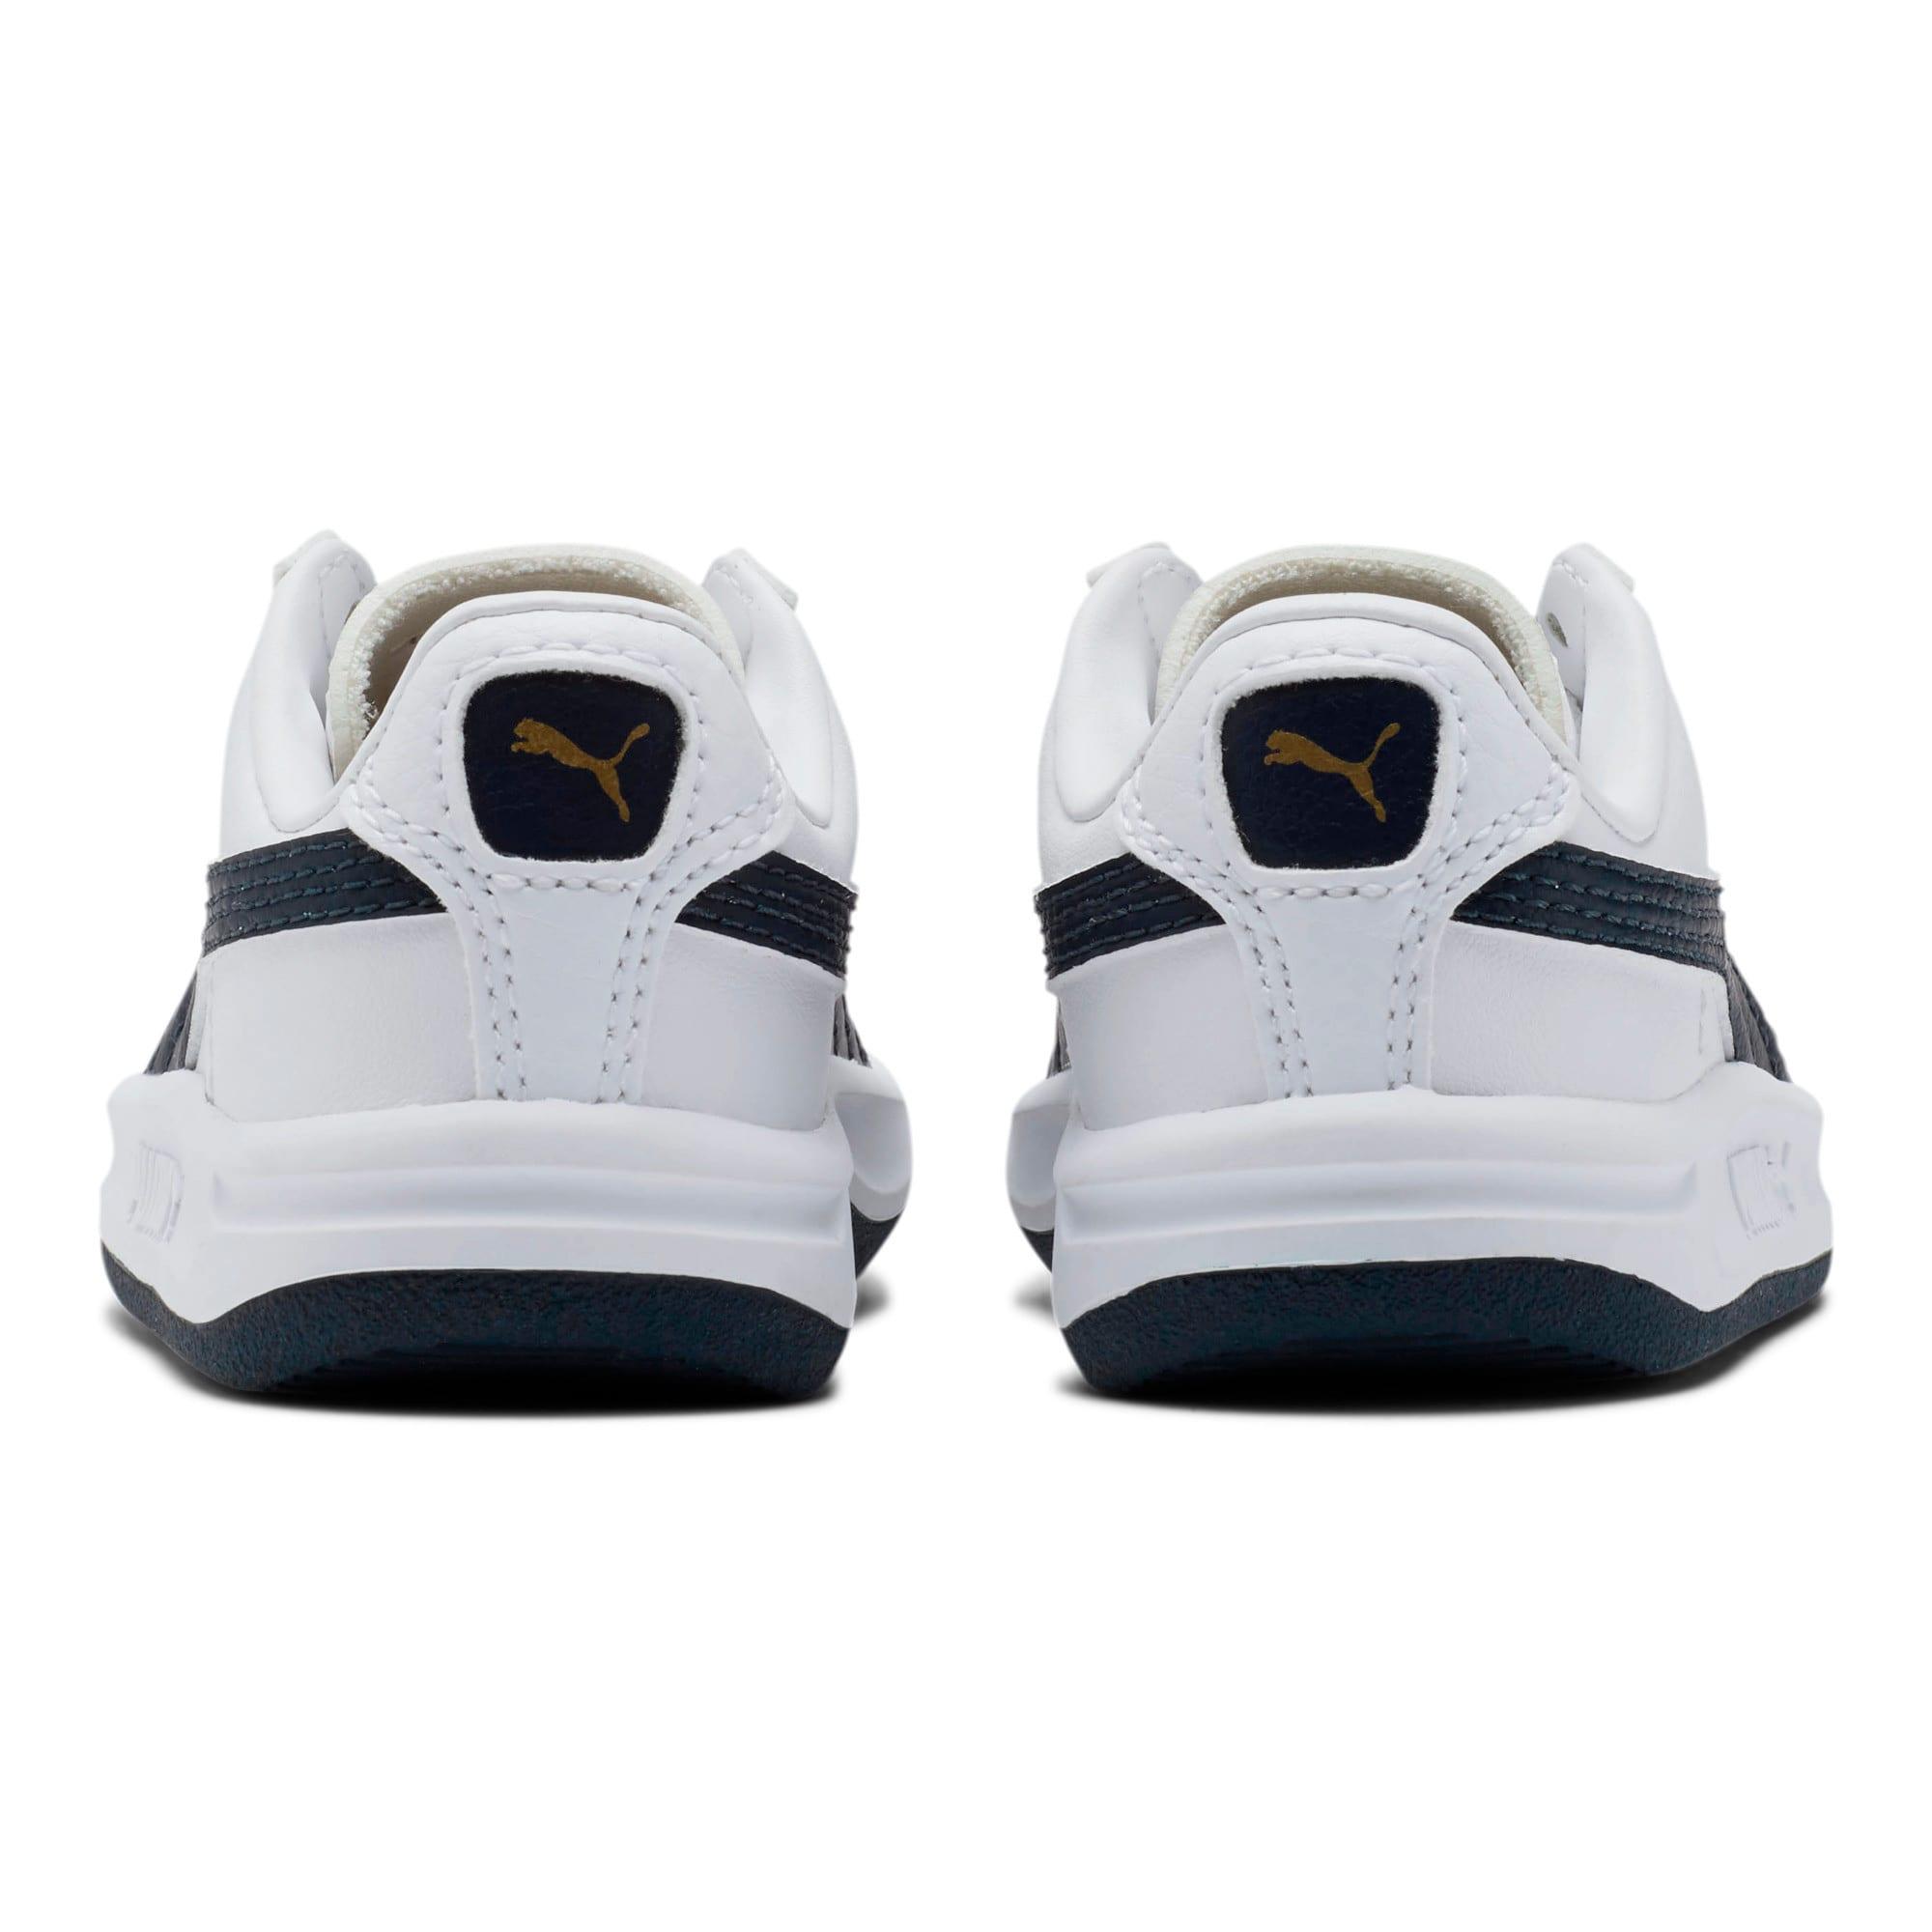 Thumbnail 3 of GV Special Toddler Shoes, Puma White-Peacoat, medium